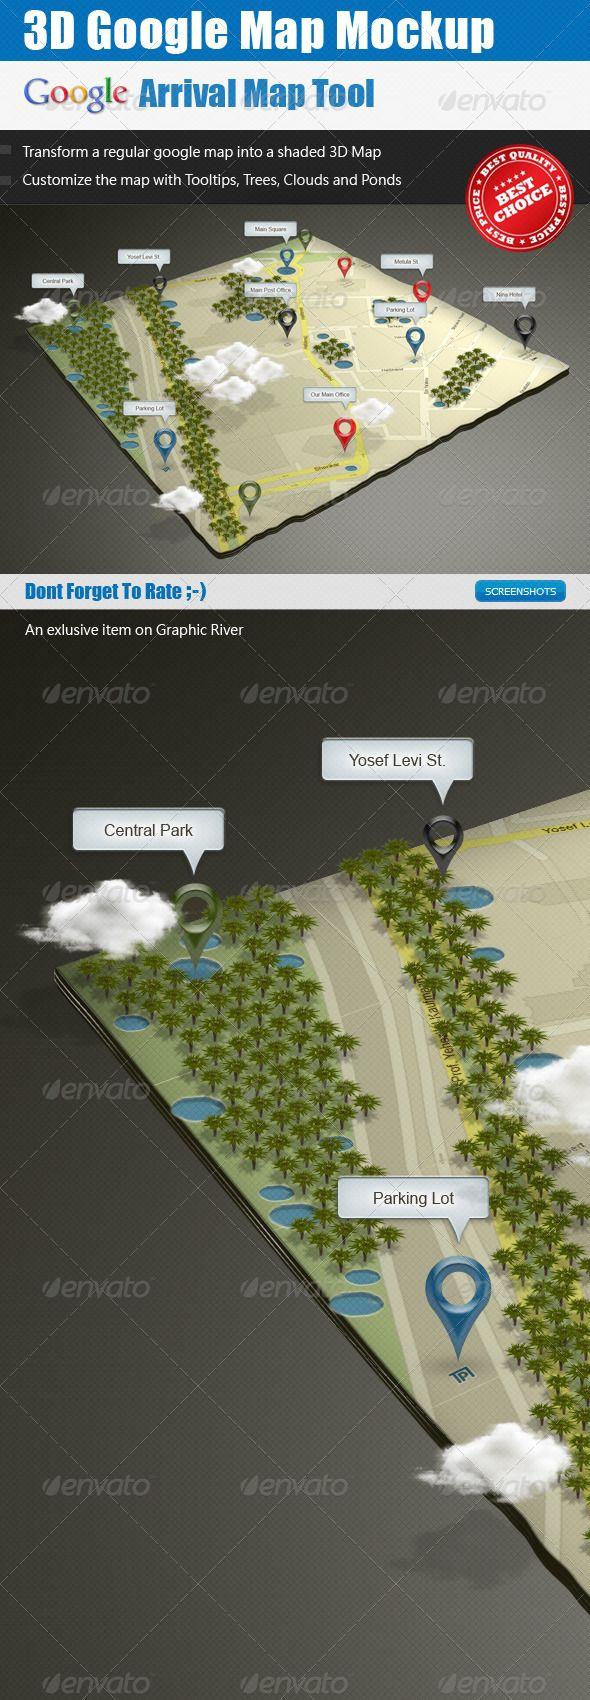 3D Google Map Mock-up | Mockup, Psd templates and Graphics